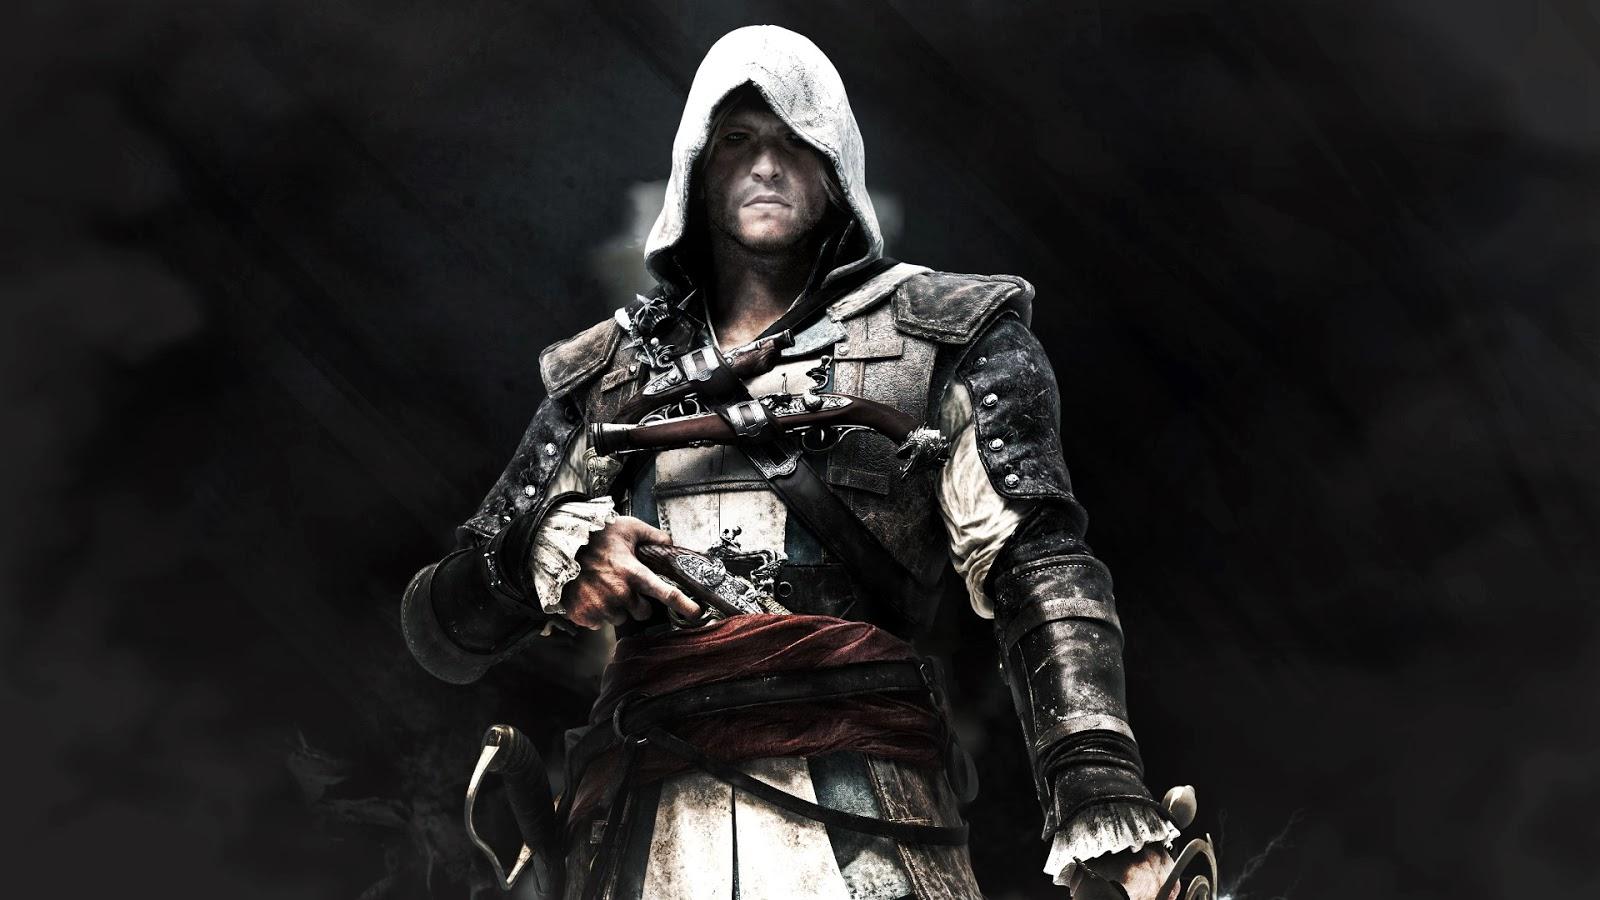 Assassin's Creed IV Black Flag HD Wallpapers - Walls720